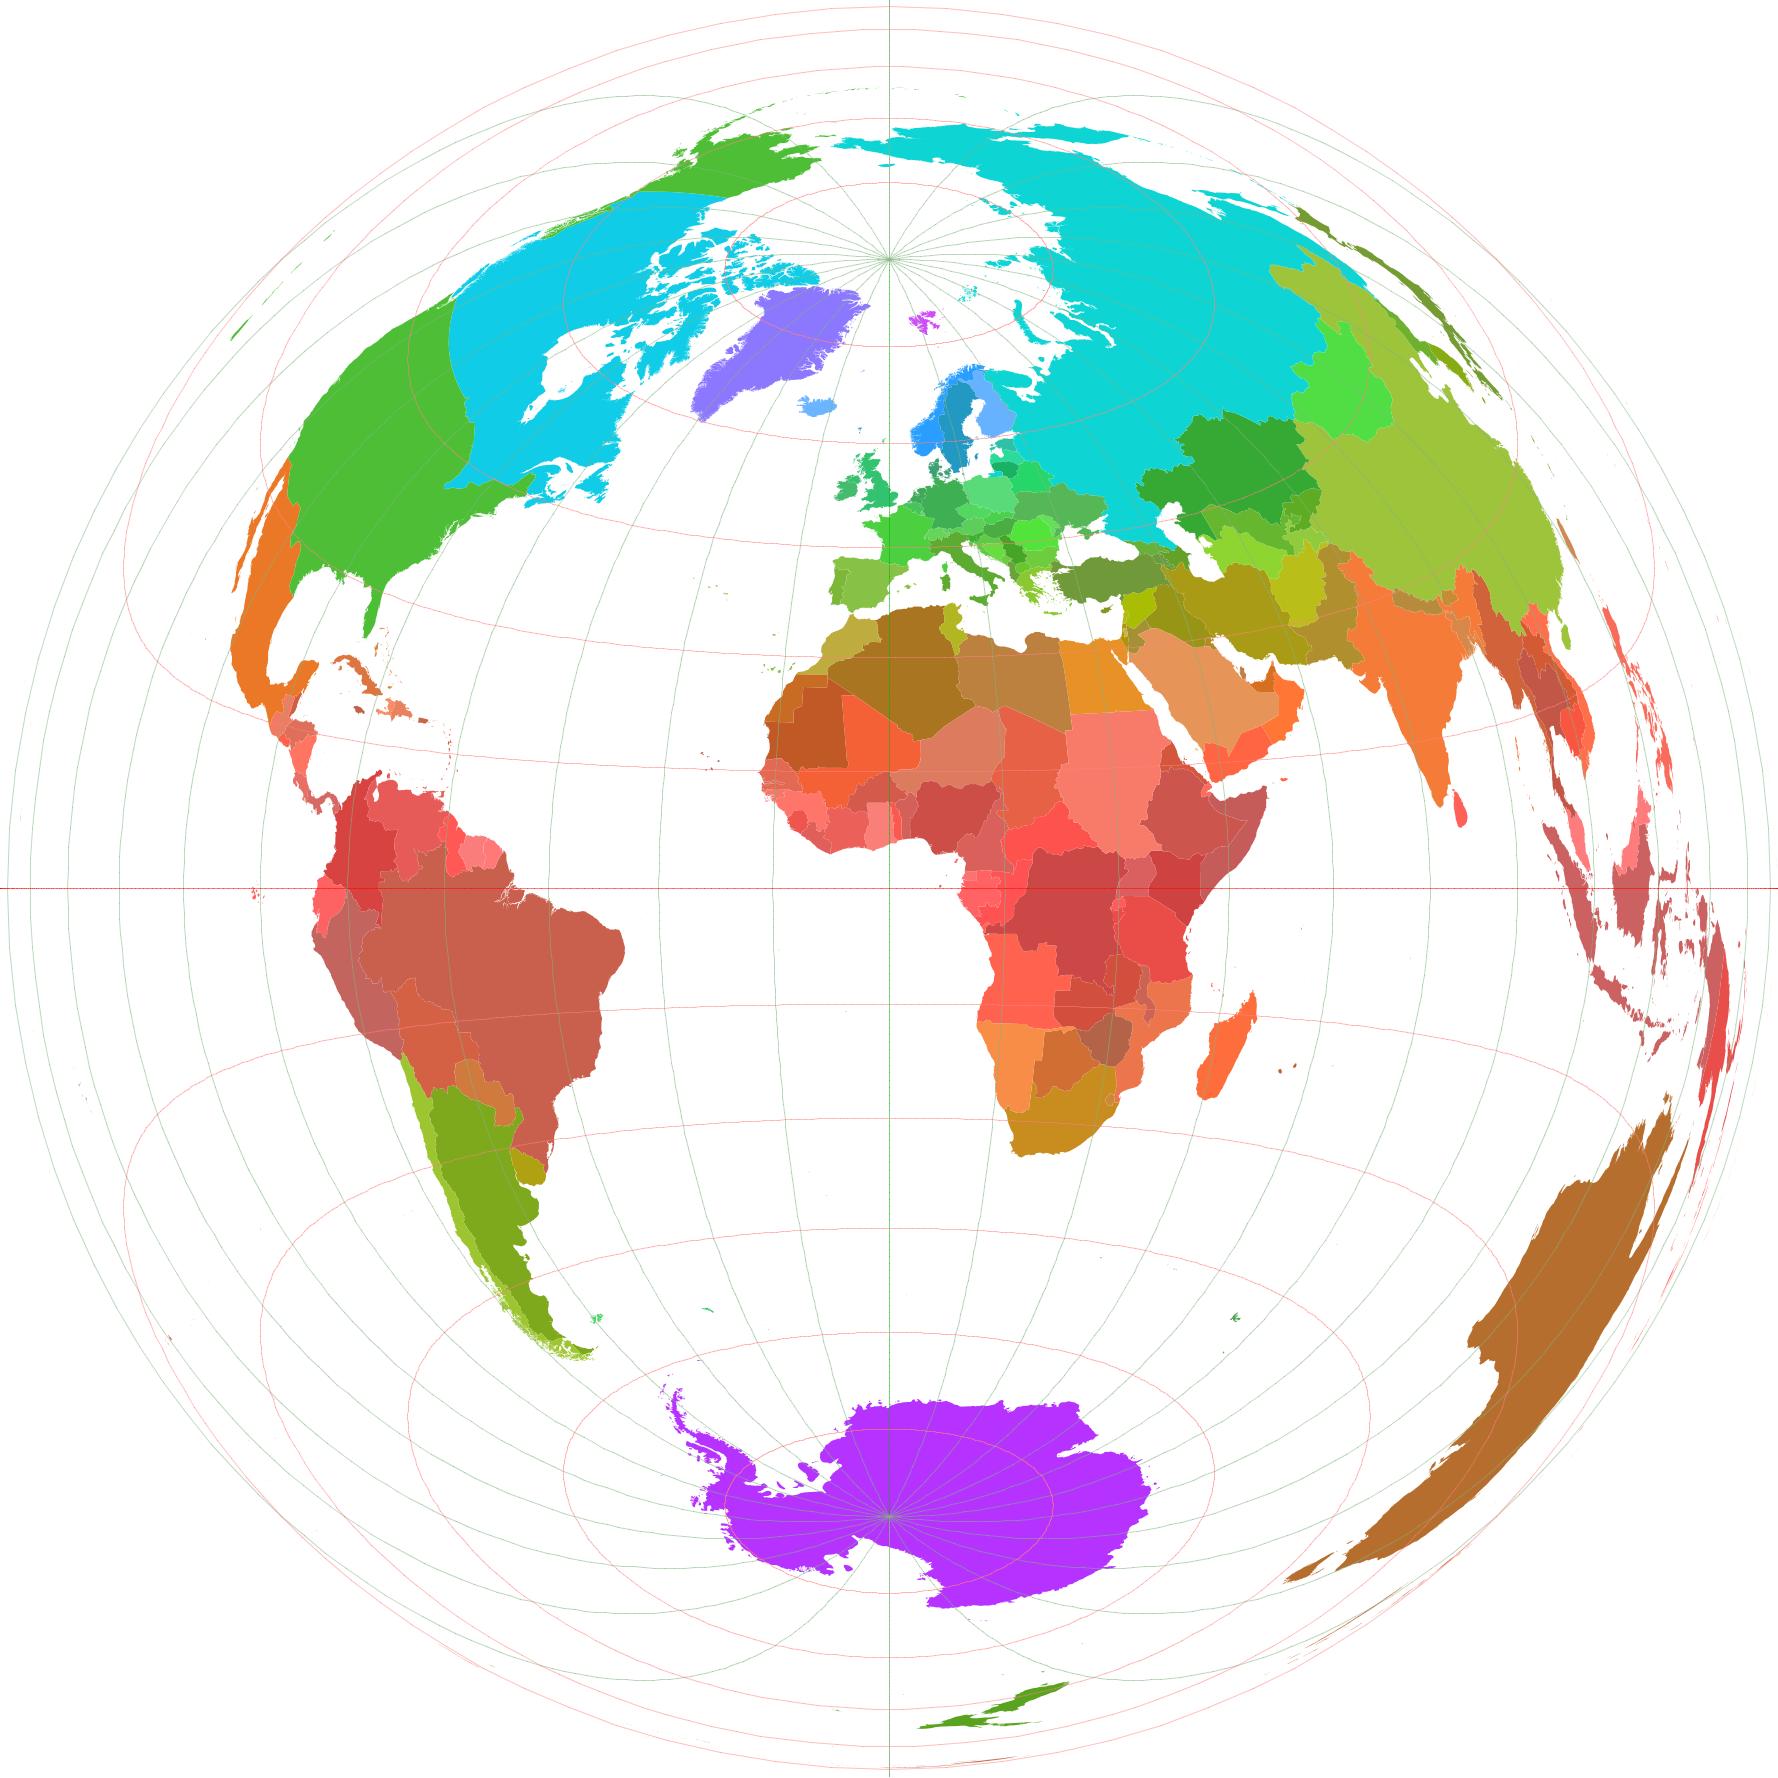 File:World borders lamb azi.png.